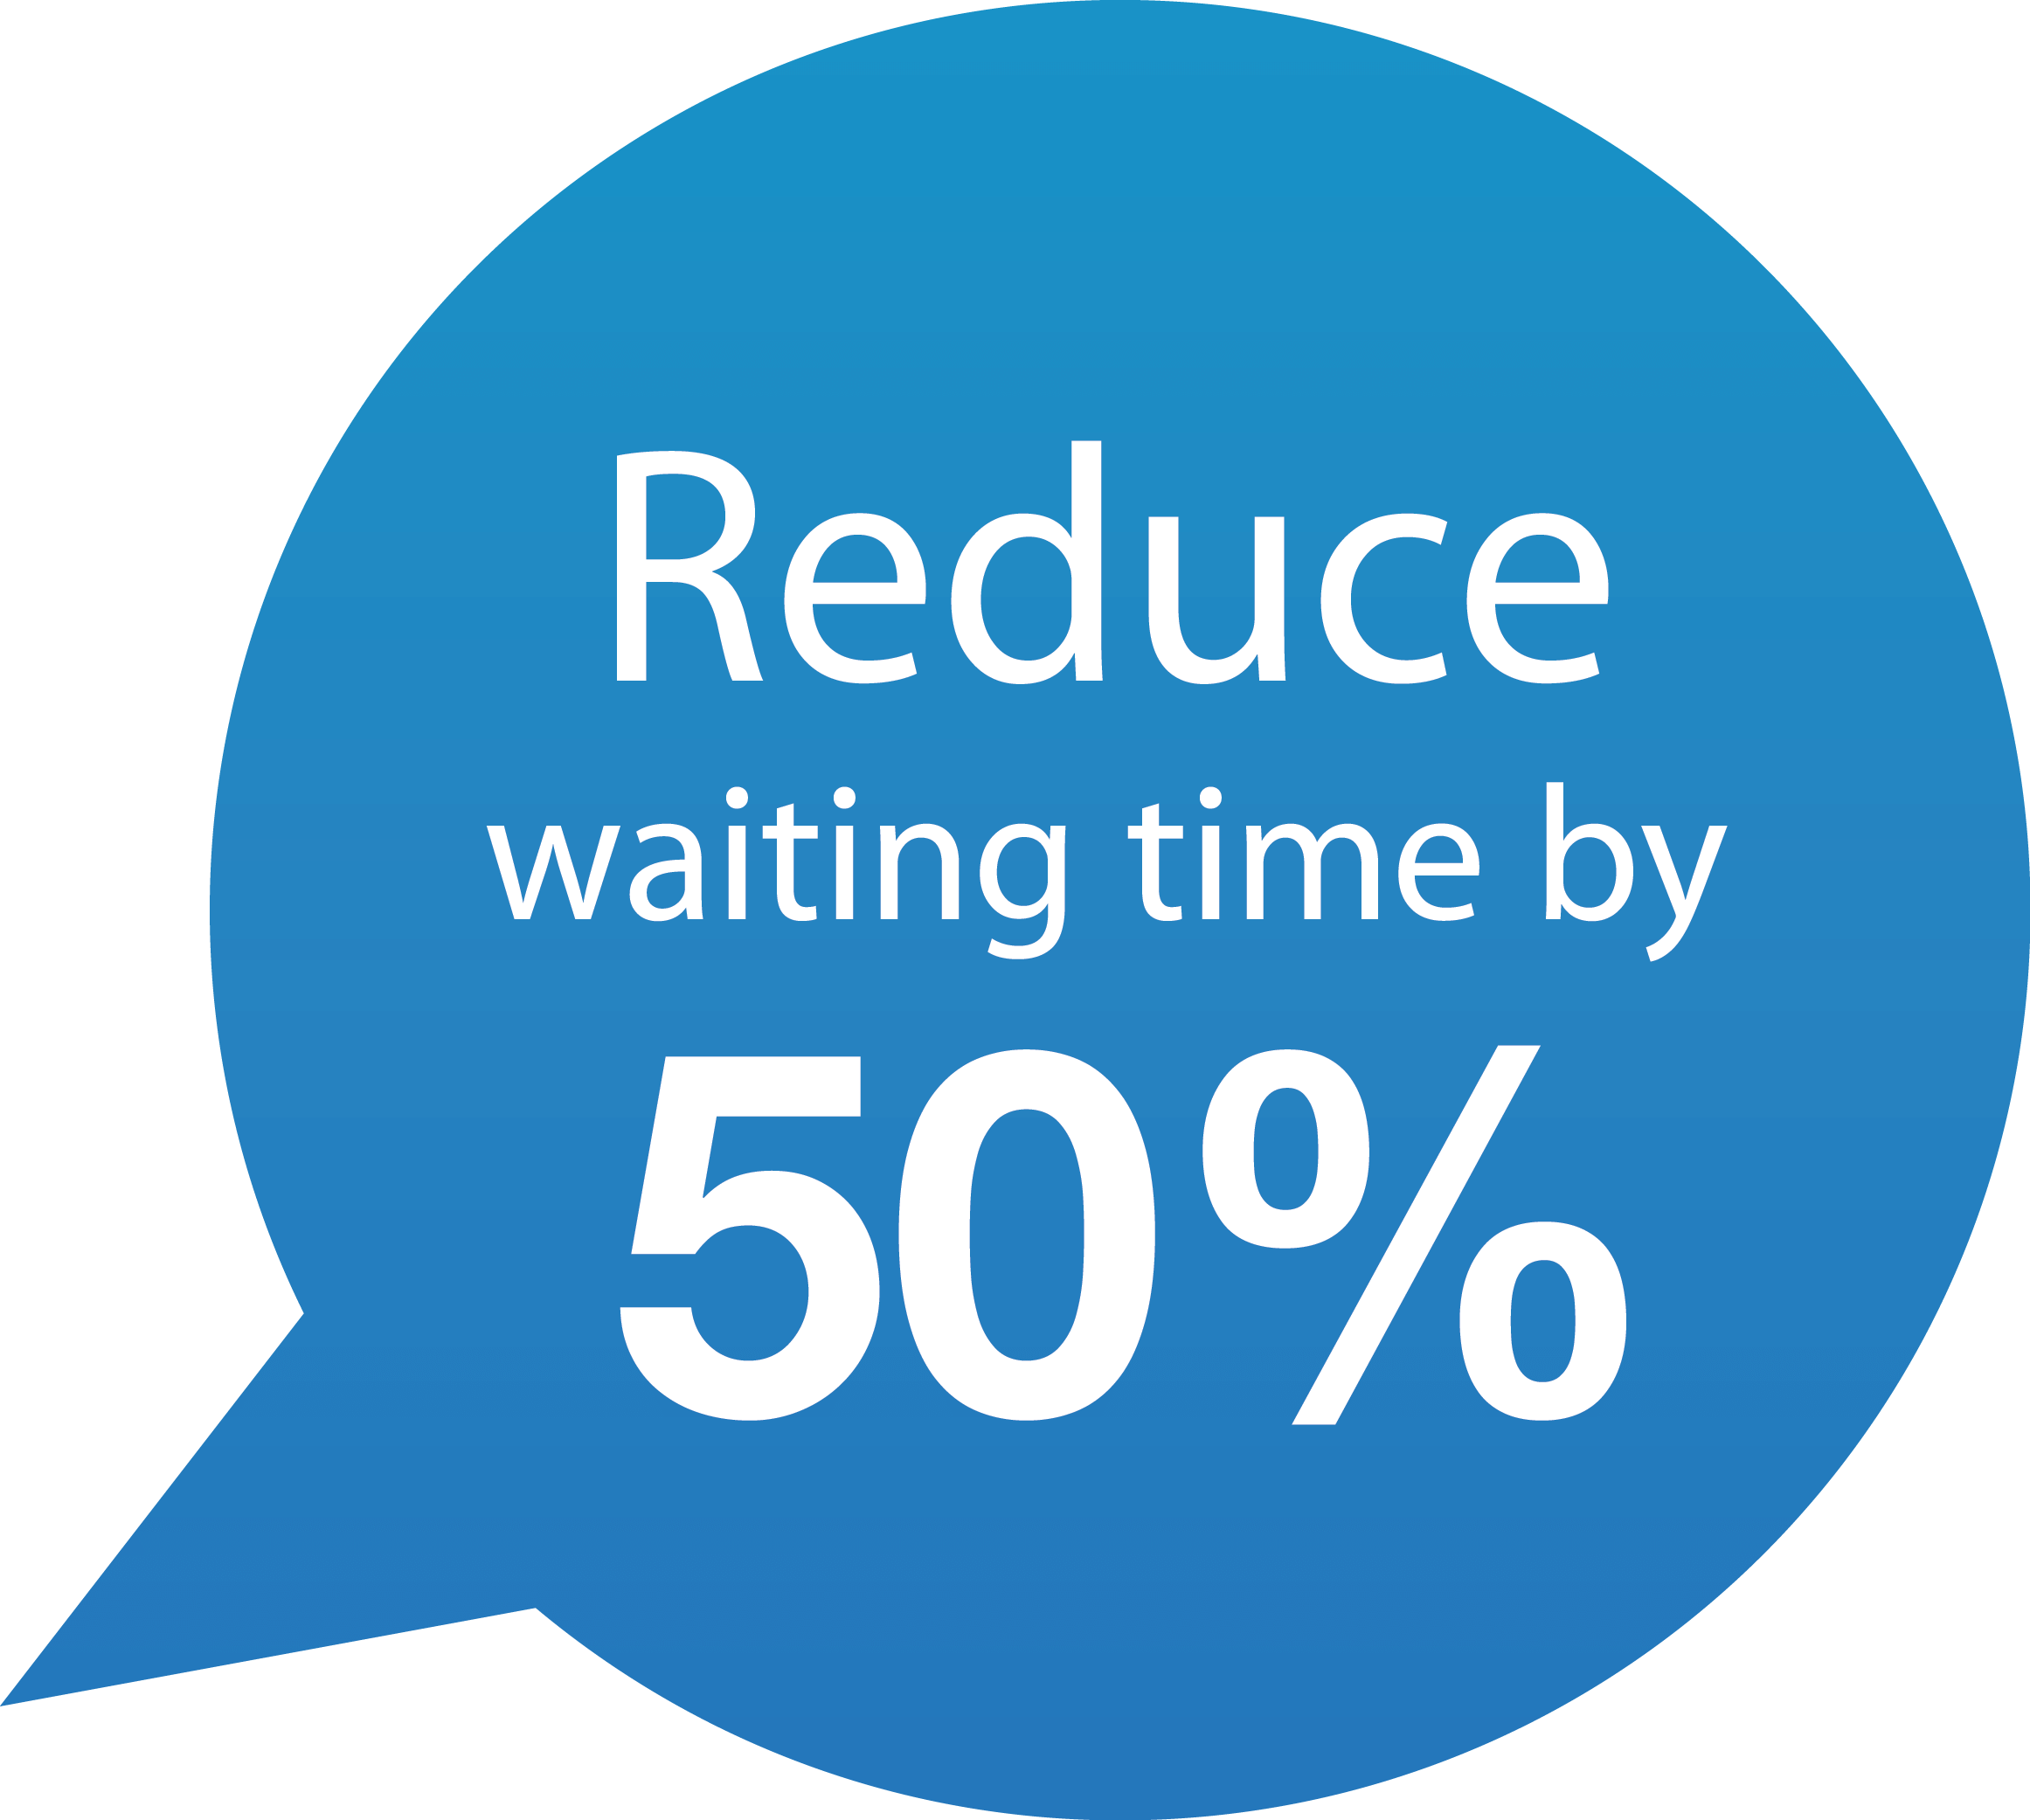 reduce-50-percent